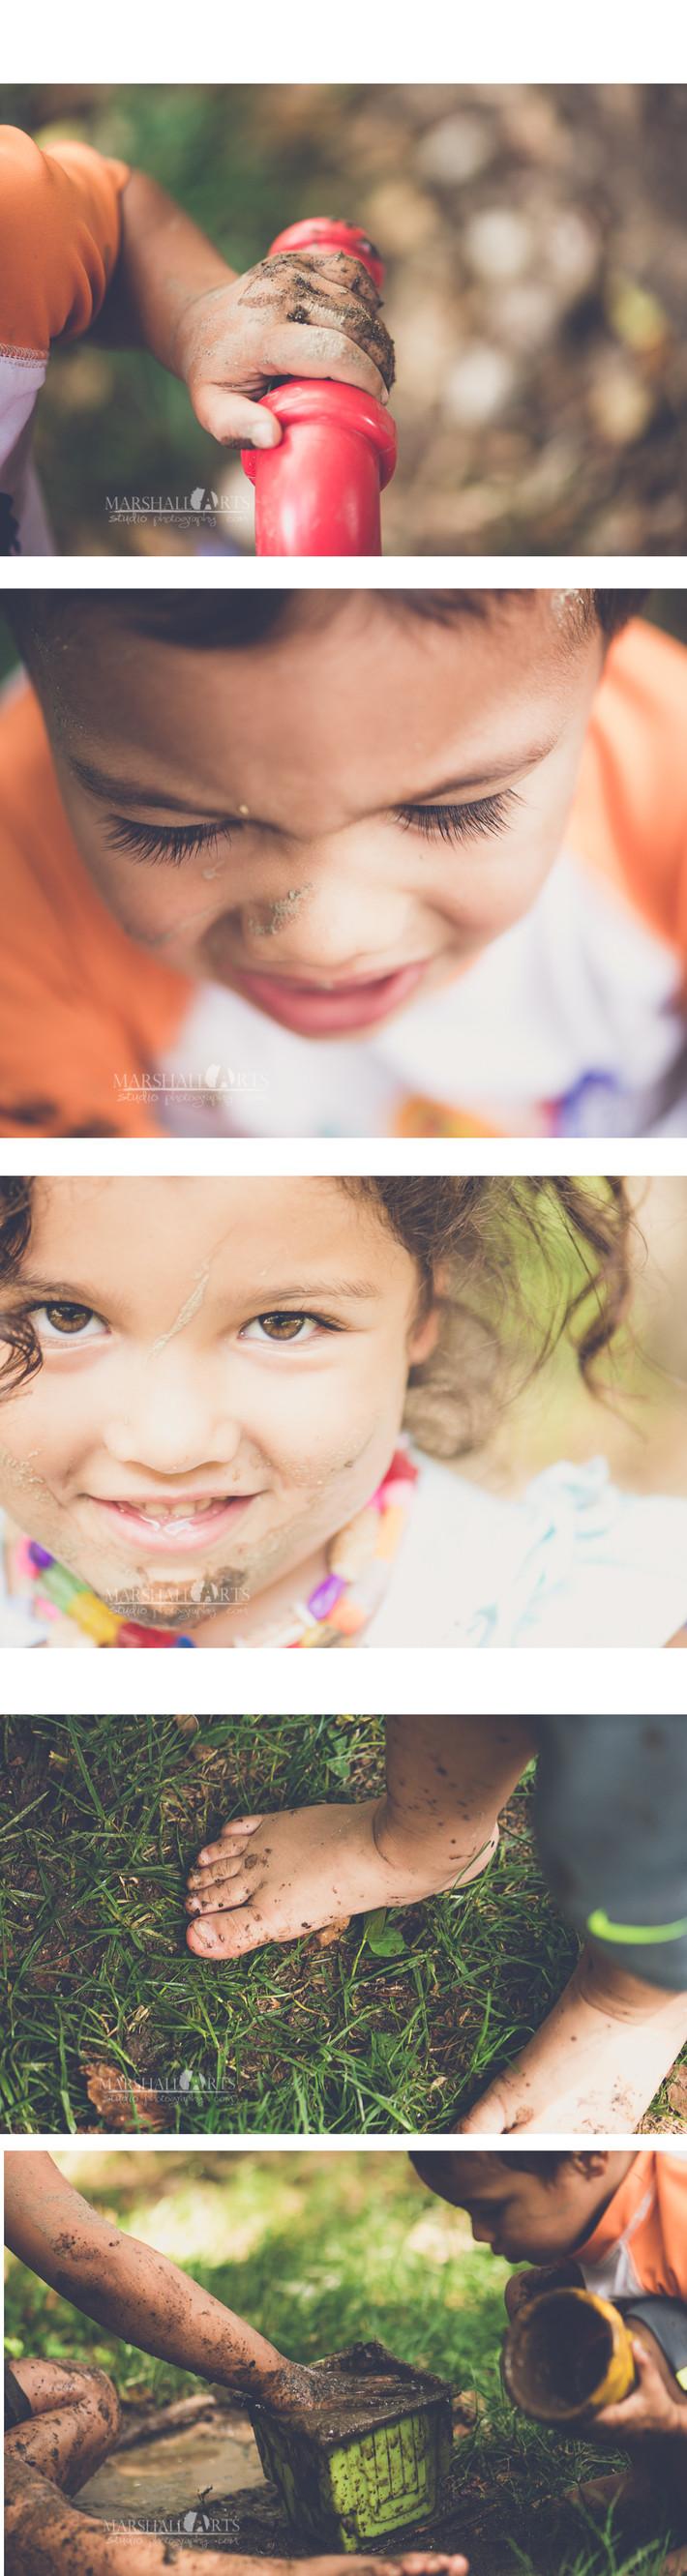 playing in the mud nikon d610 nikkor 105 macro  fun family children